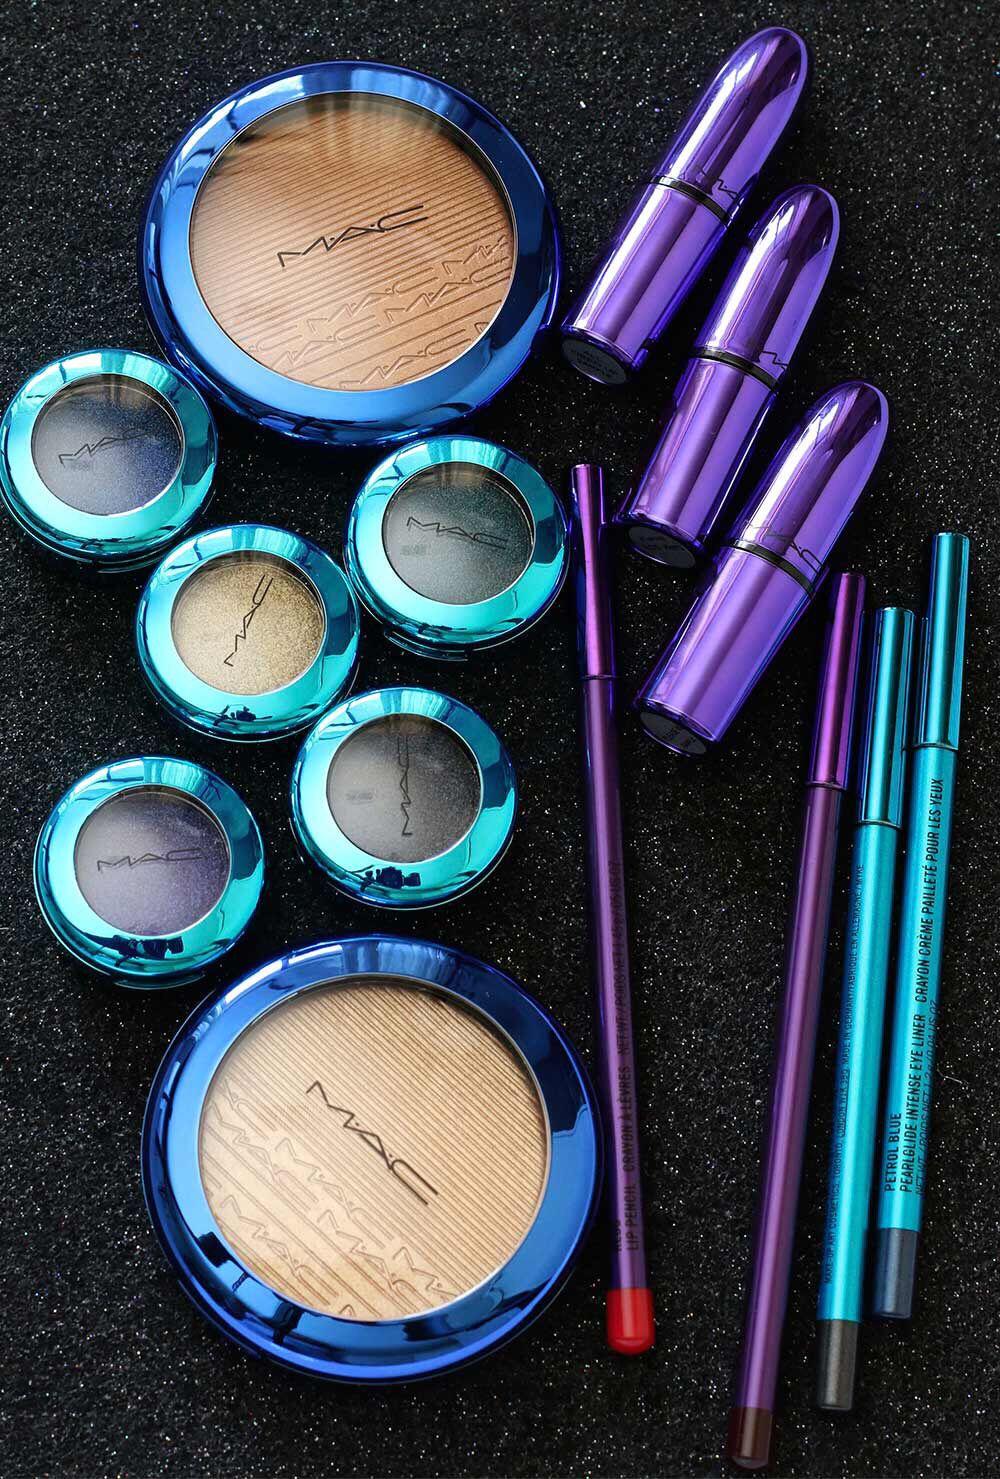 MAC 2015 Holiday Line Makeup and beauty blog, Makeup